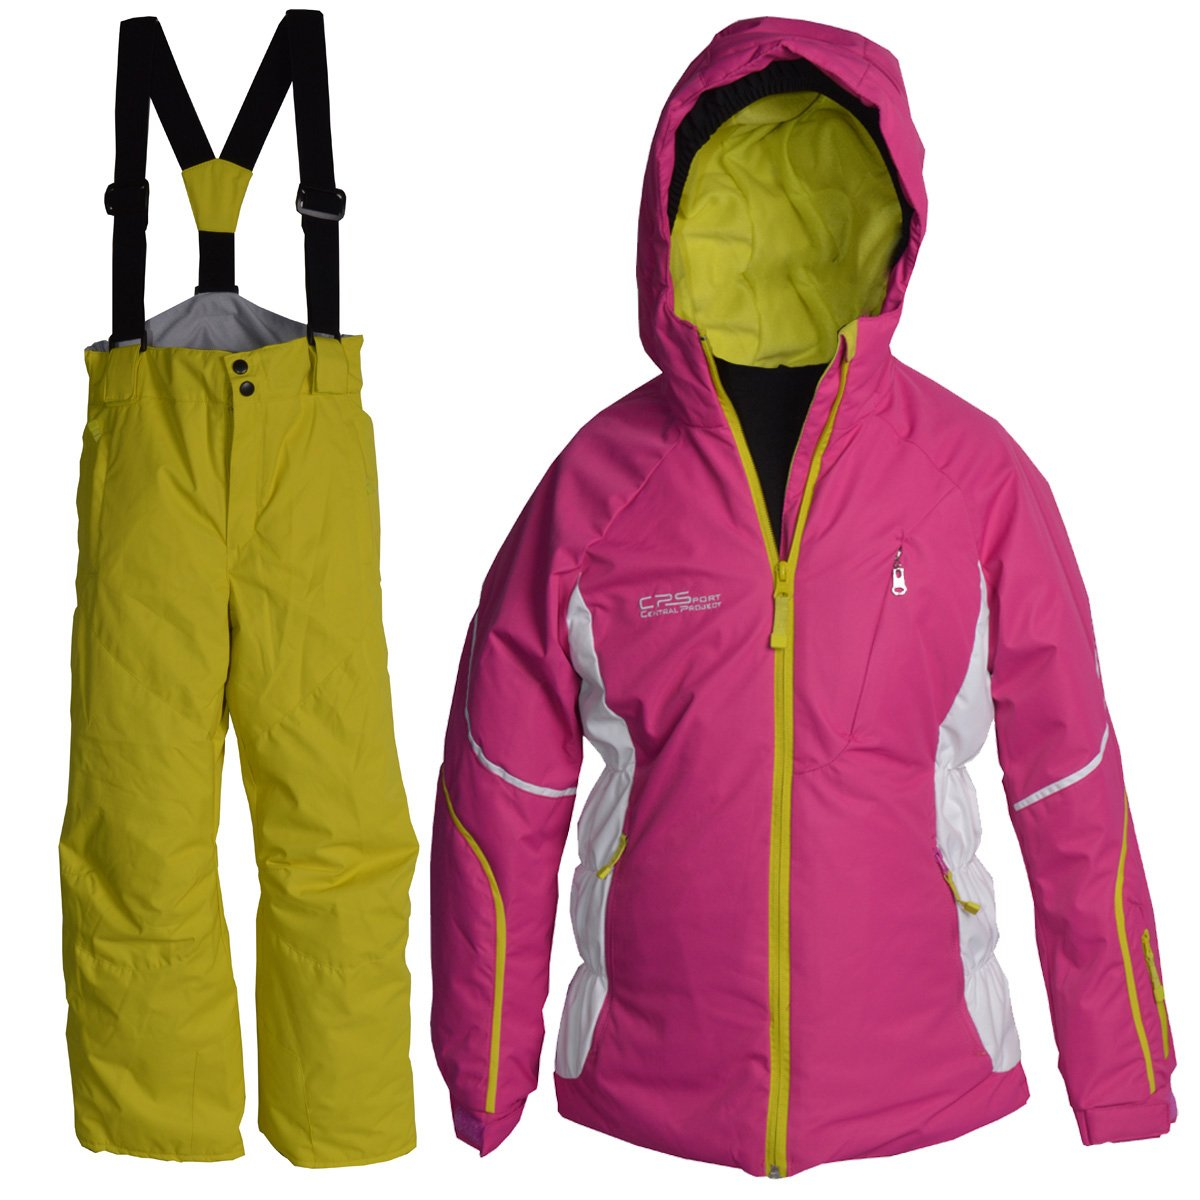 Central Project Mädchen Ski Anzug Cristina günstig kaufen